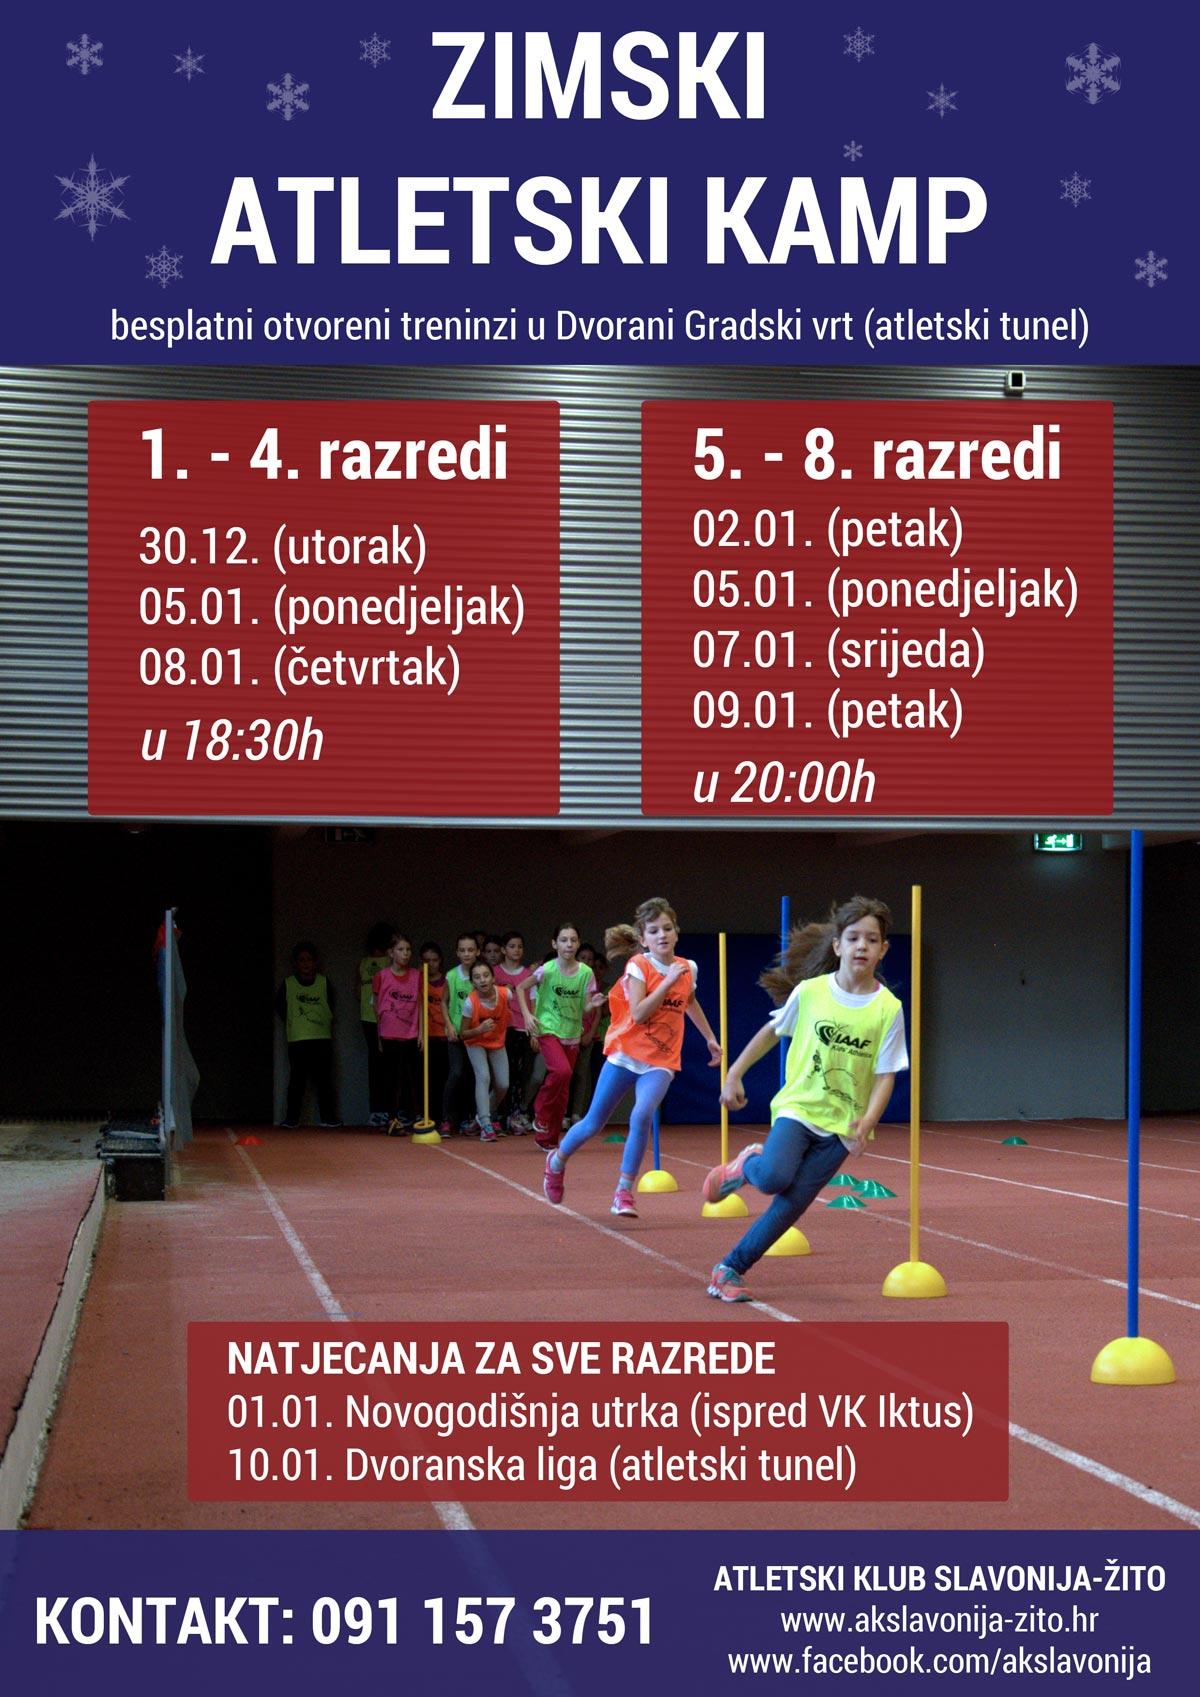 Plakat-Zimski-atletski-kamp-2015